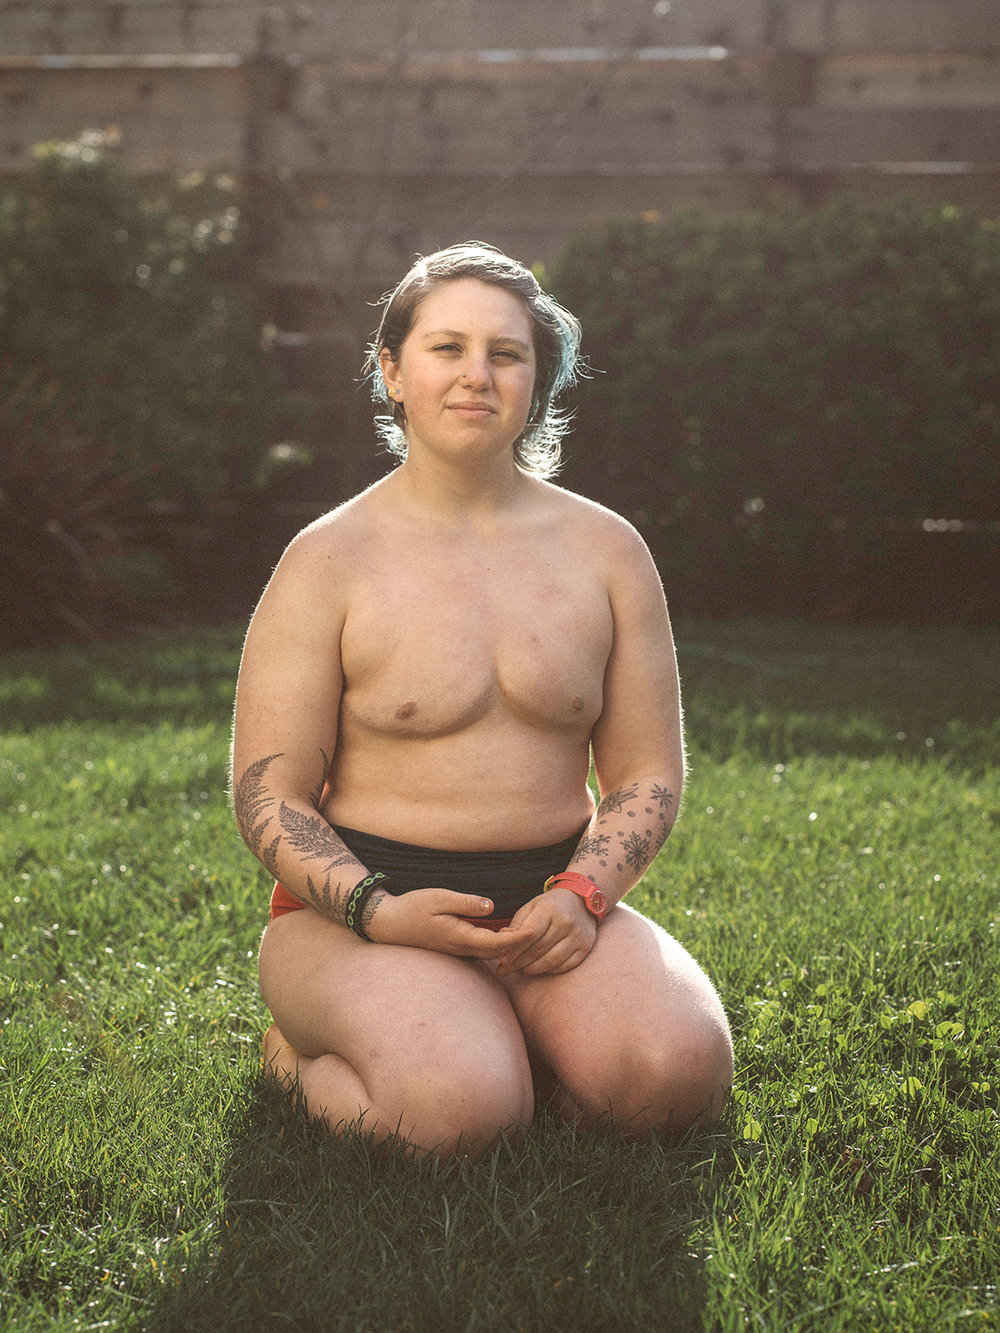 Davi,20, Gender Neutral, Oakland California